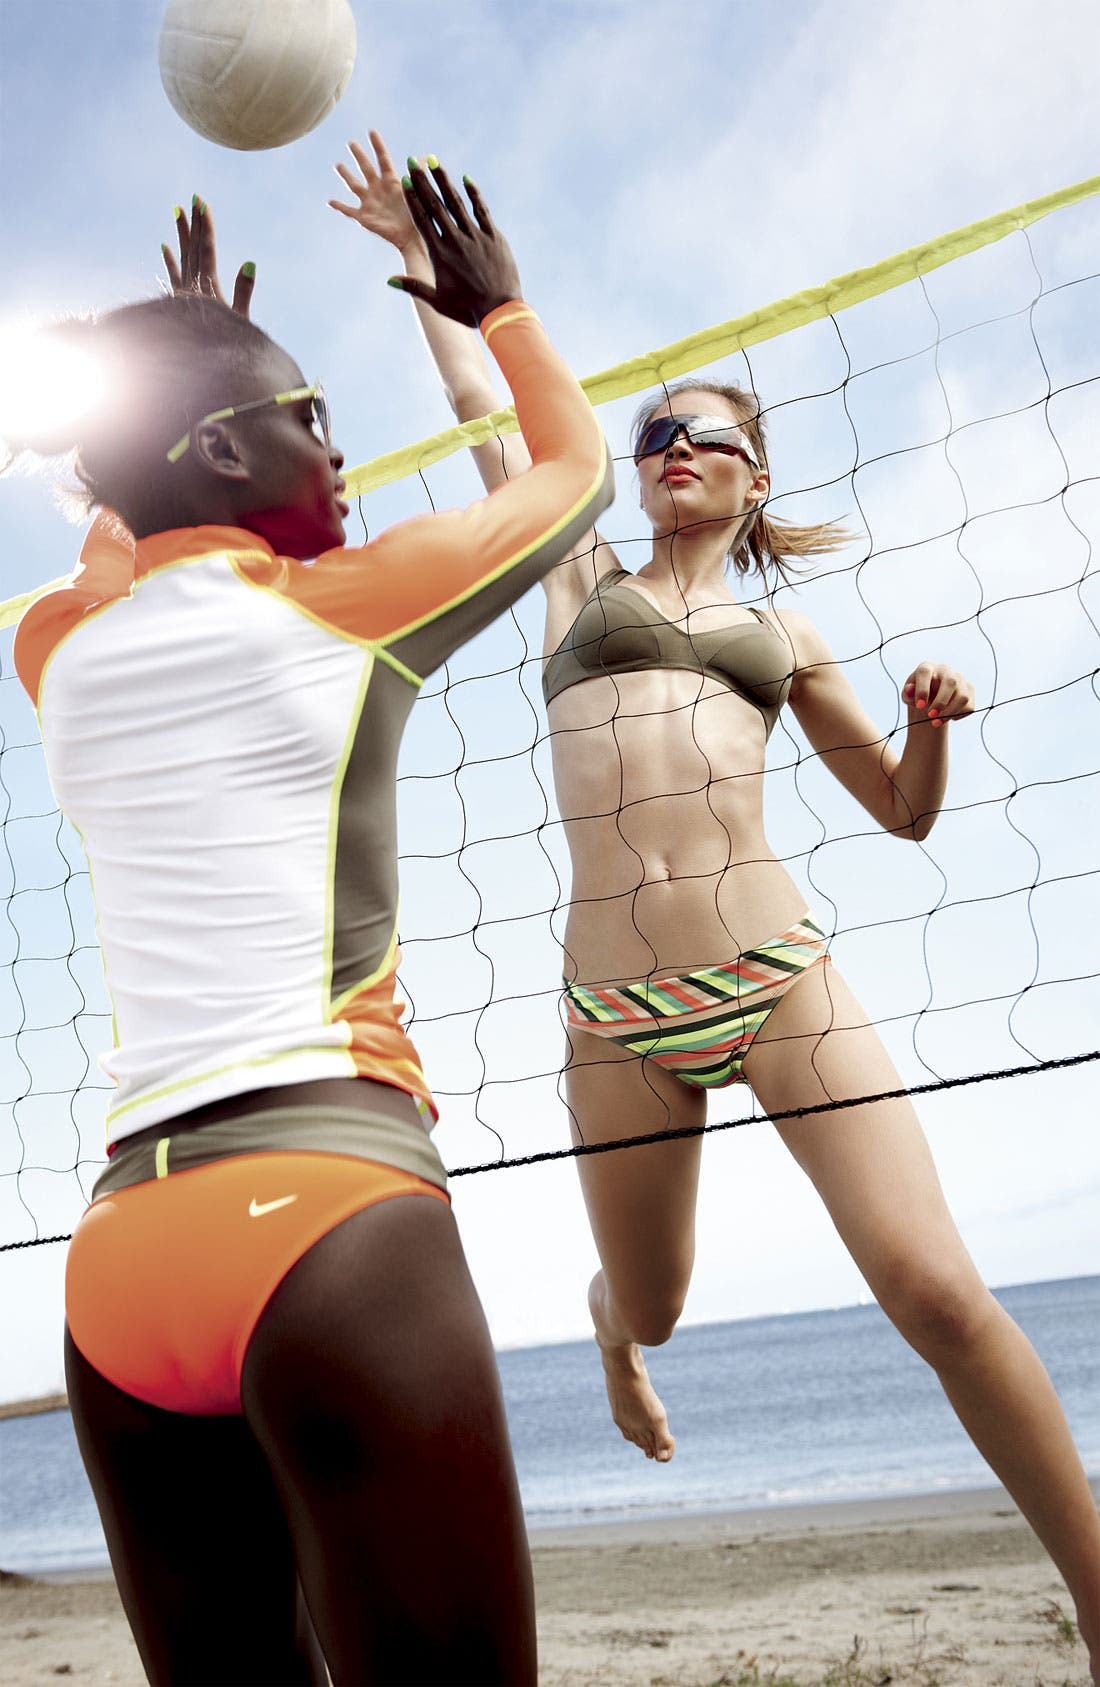 Alternate Image 1 Selected - Nike Bikini Top & Bottoms